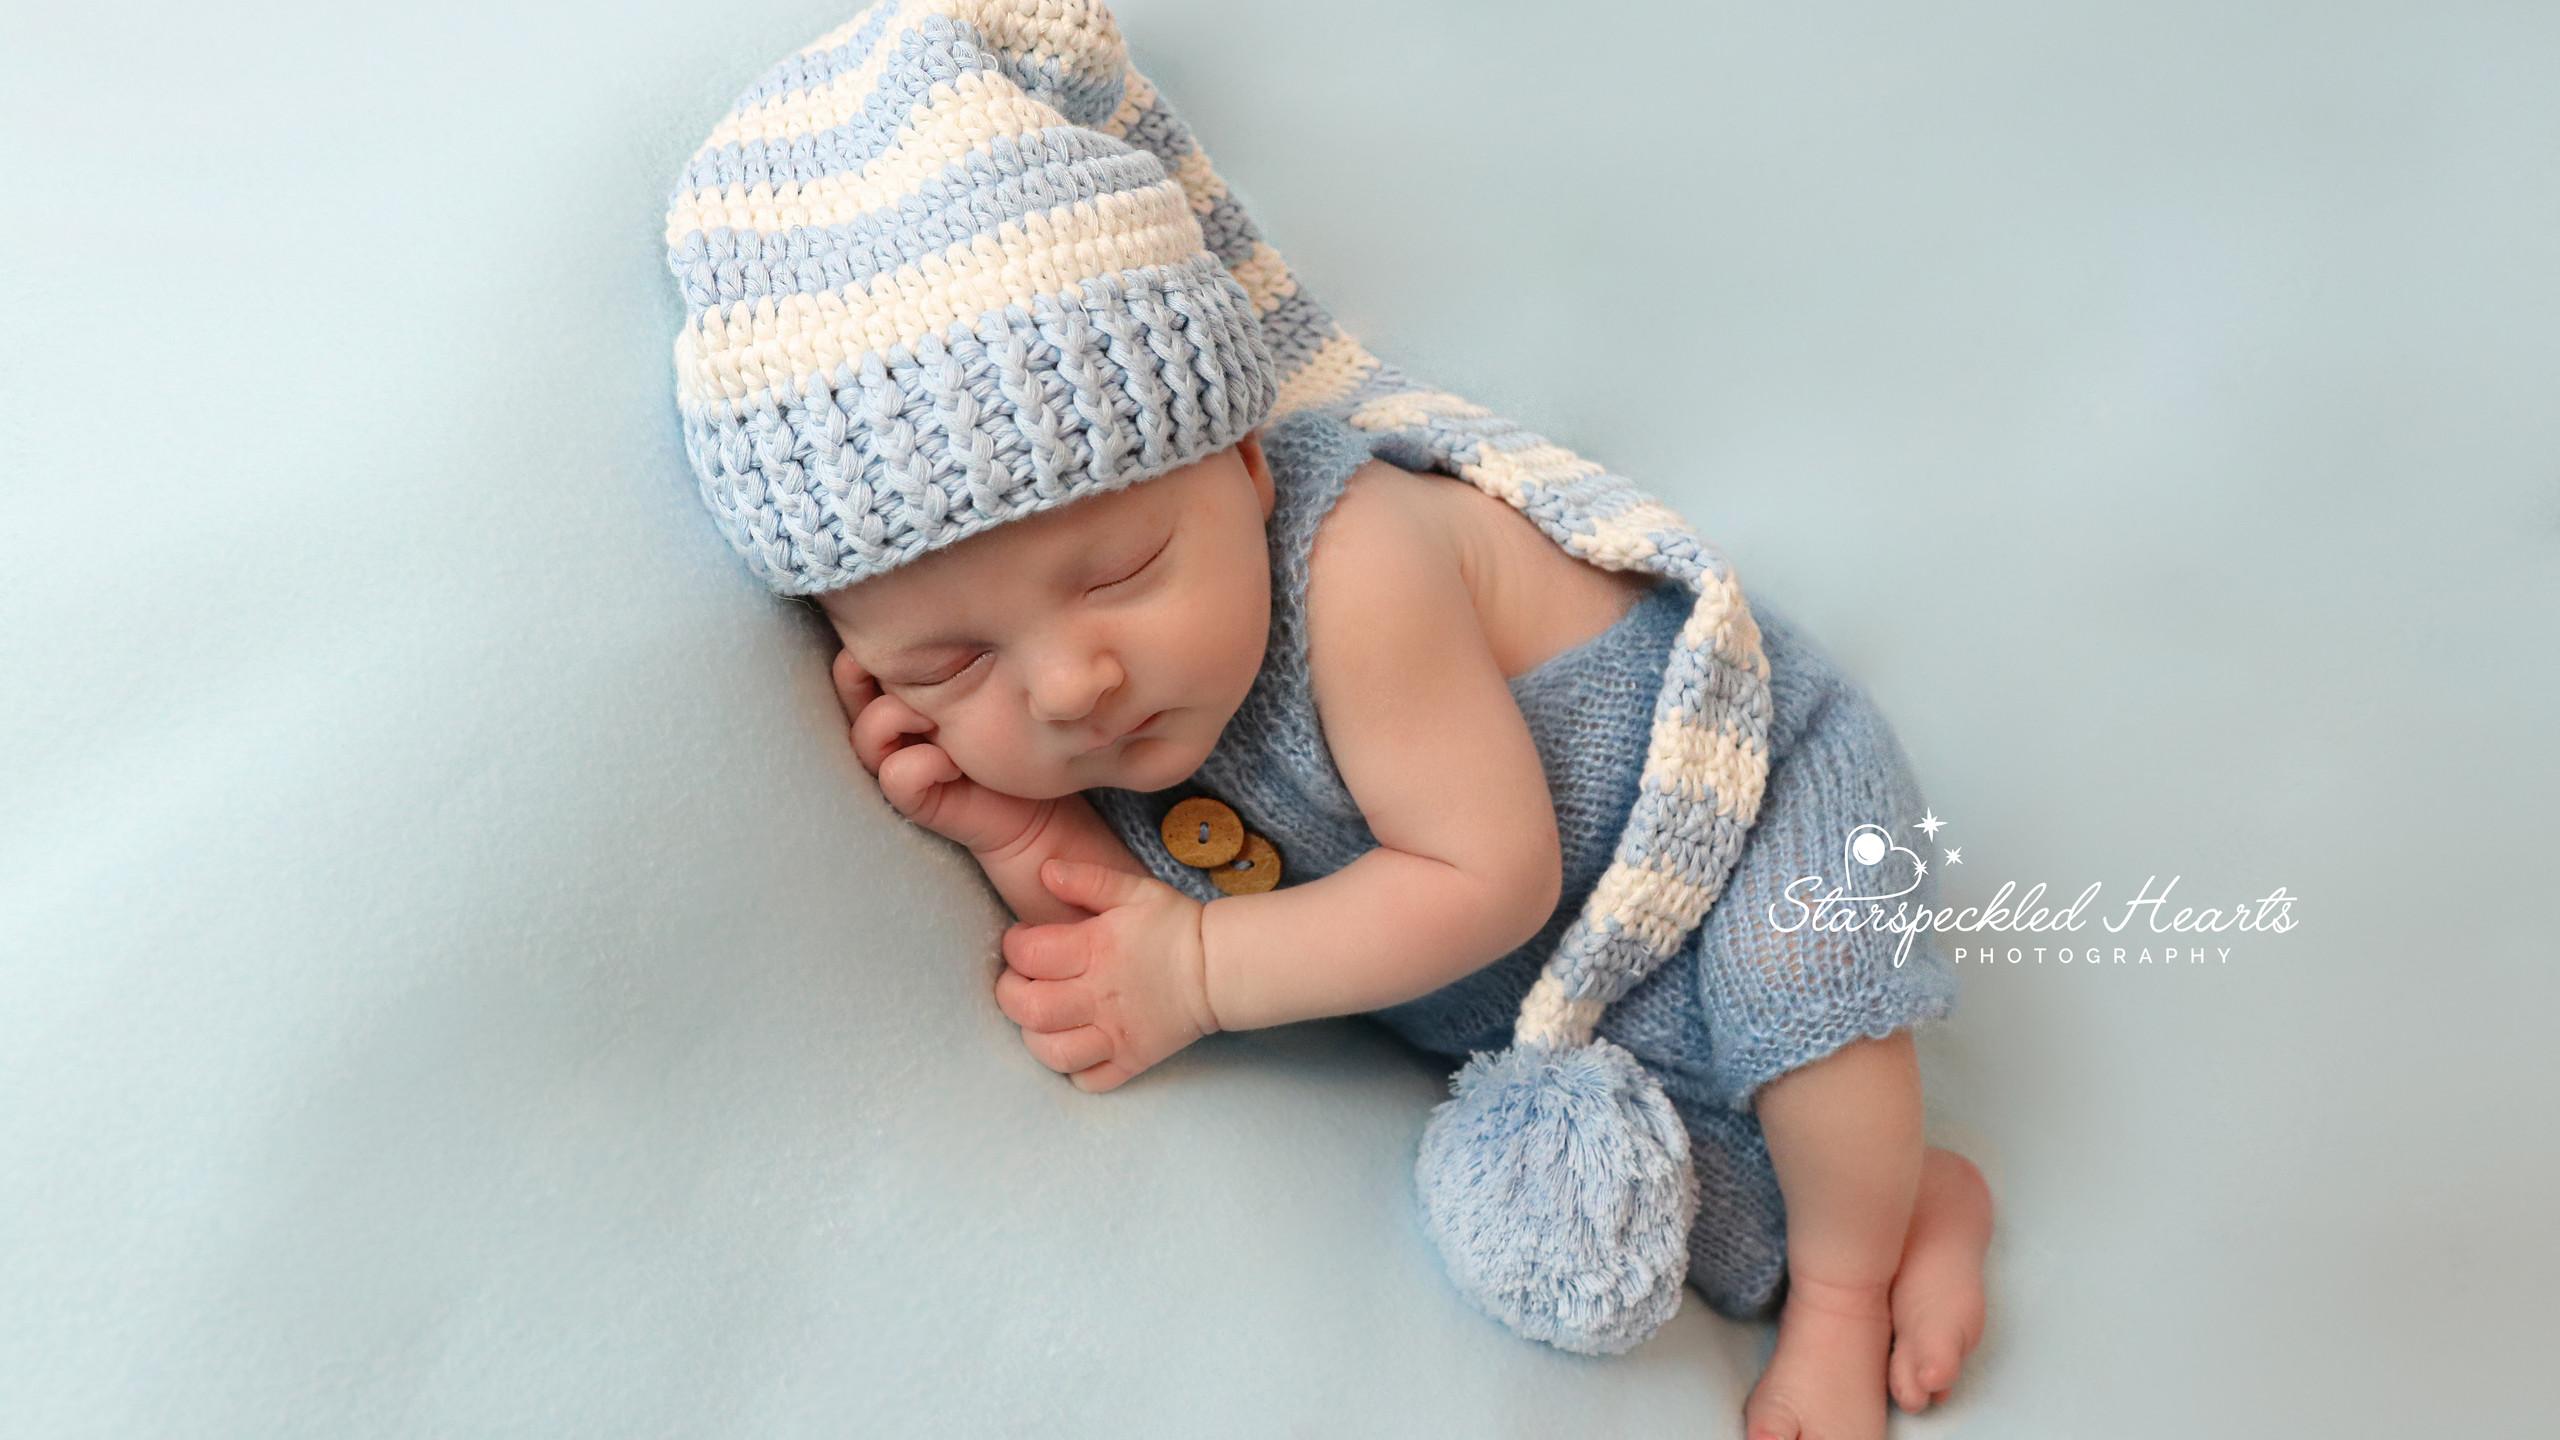 sleeping newborn lying on side wearing blue romper and blue striped hat